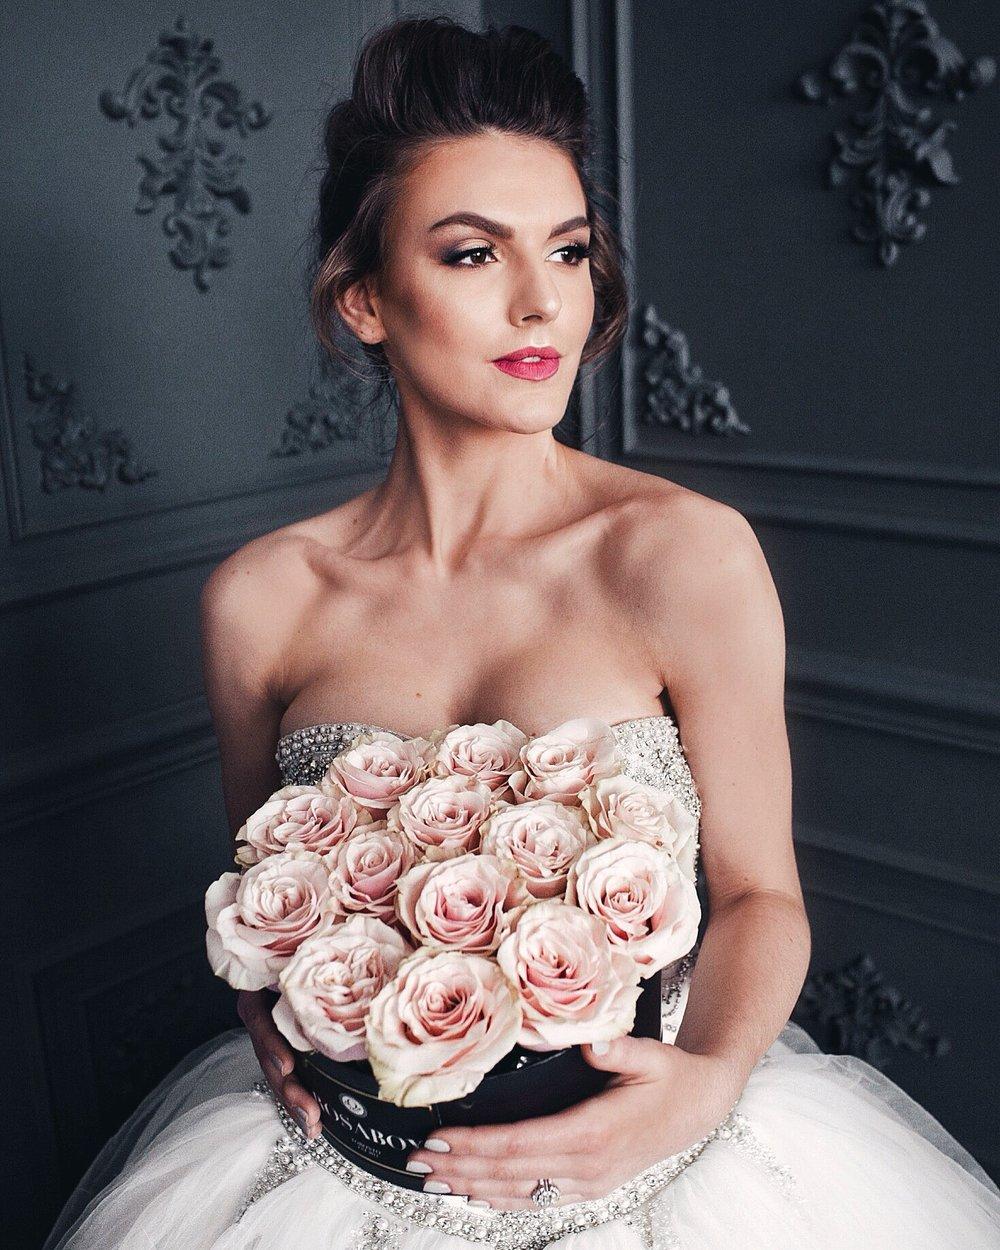 Team: Photographer: Summit Artworks Event Planning/Florals: Oudalova Events & Design  HMU: me 🙋♀️ for Covet Co  Venue: Mint Room Studios Gown: Ana Koi Bridal